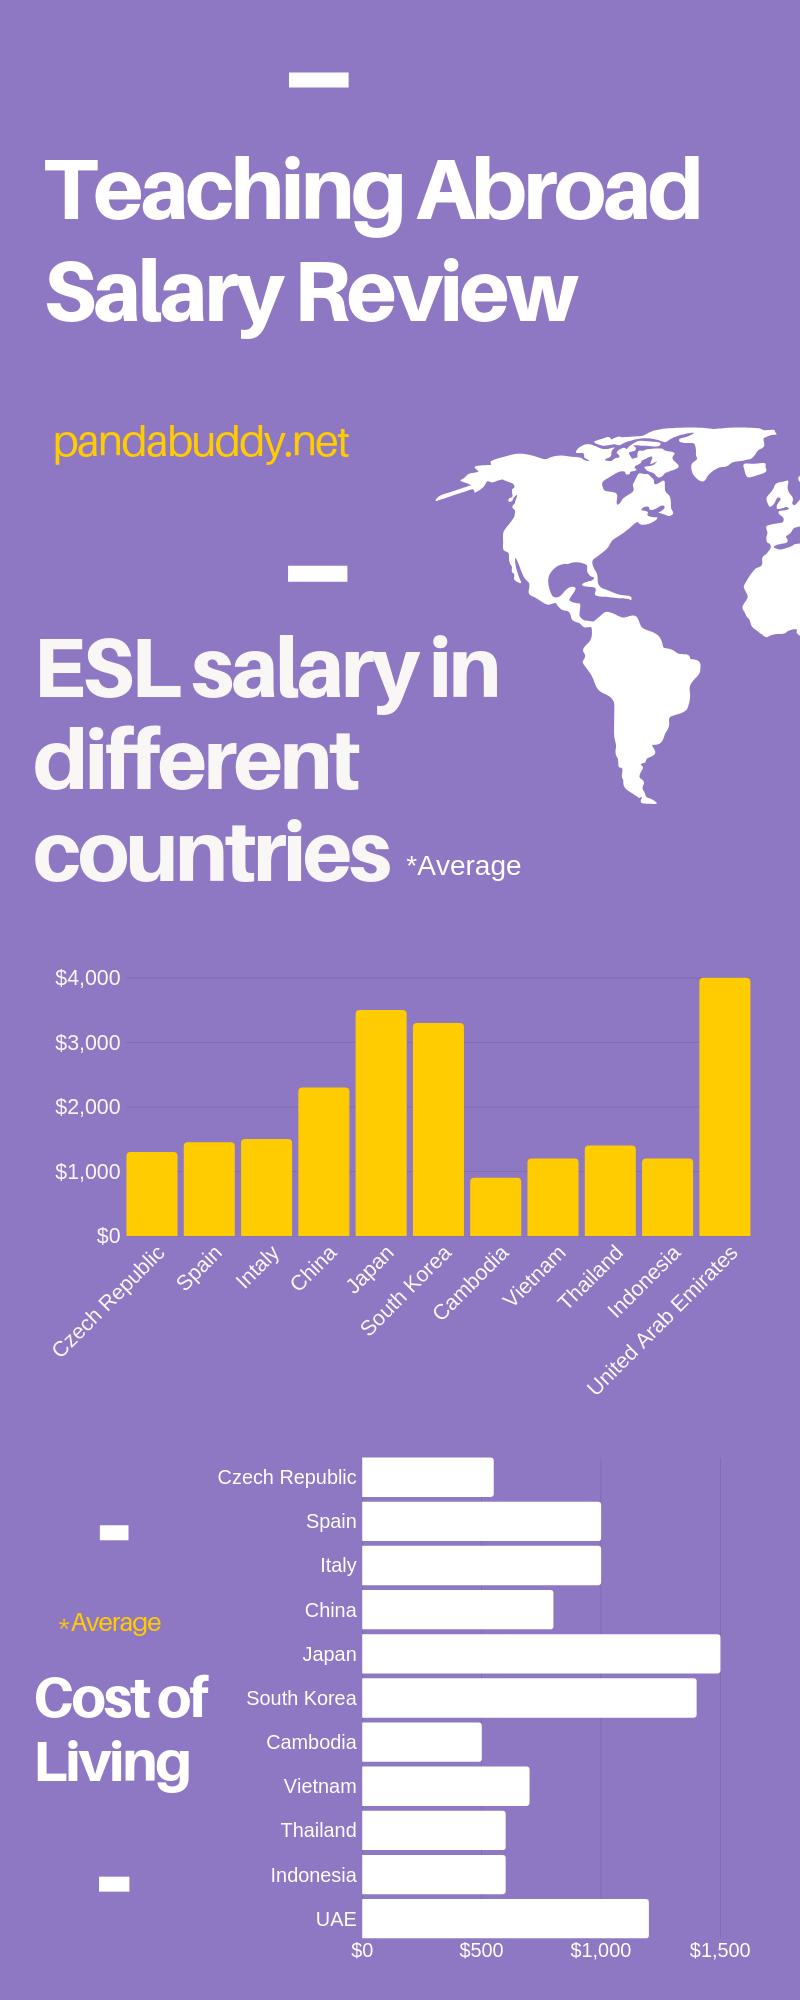 Teaching English abroad salary varies depending on where